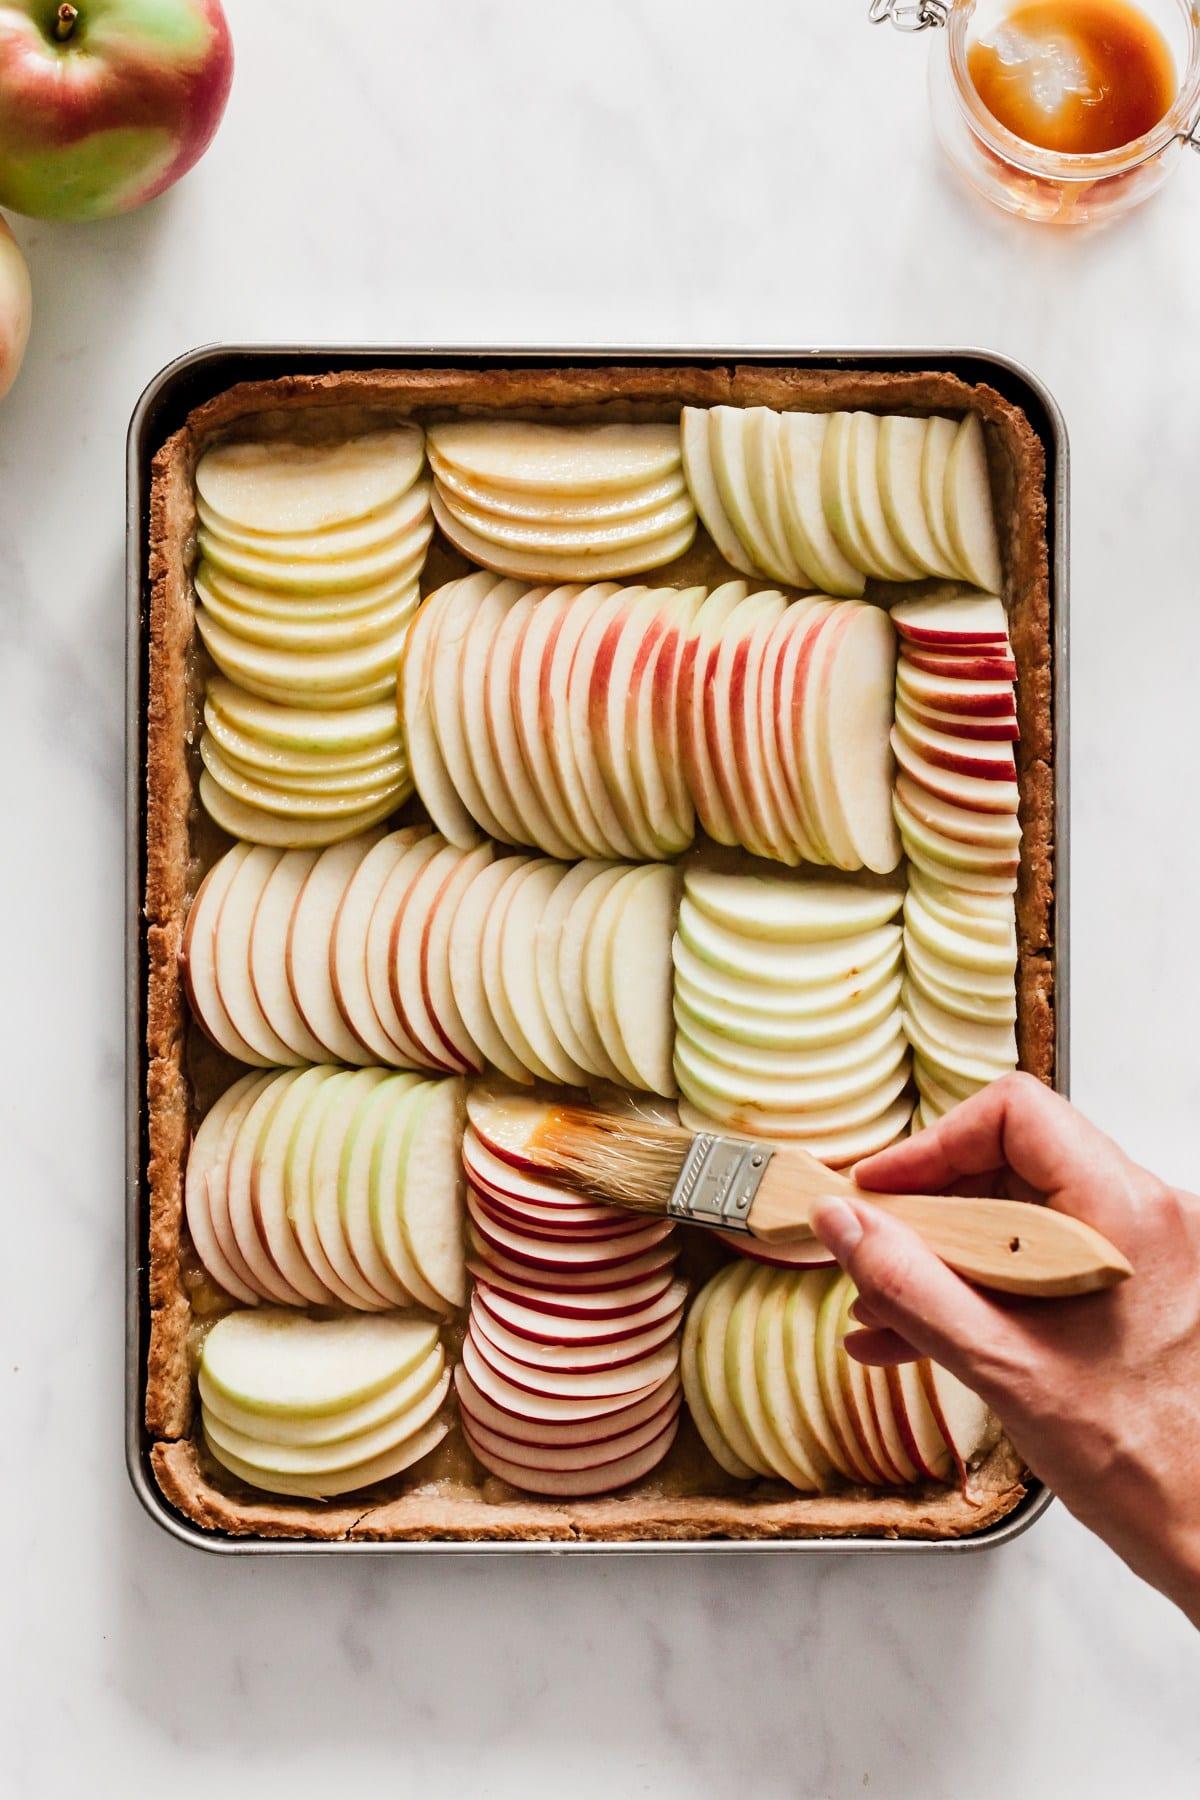 Apple Tart Recipe | Thanksgiving recipes via entertaining blog @cydconverse